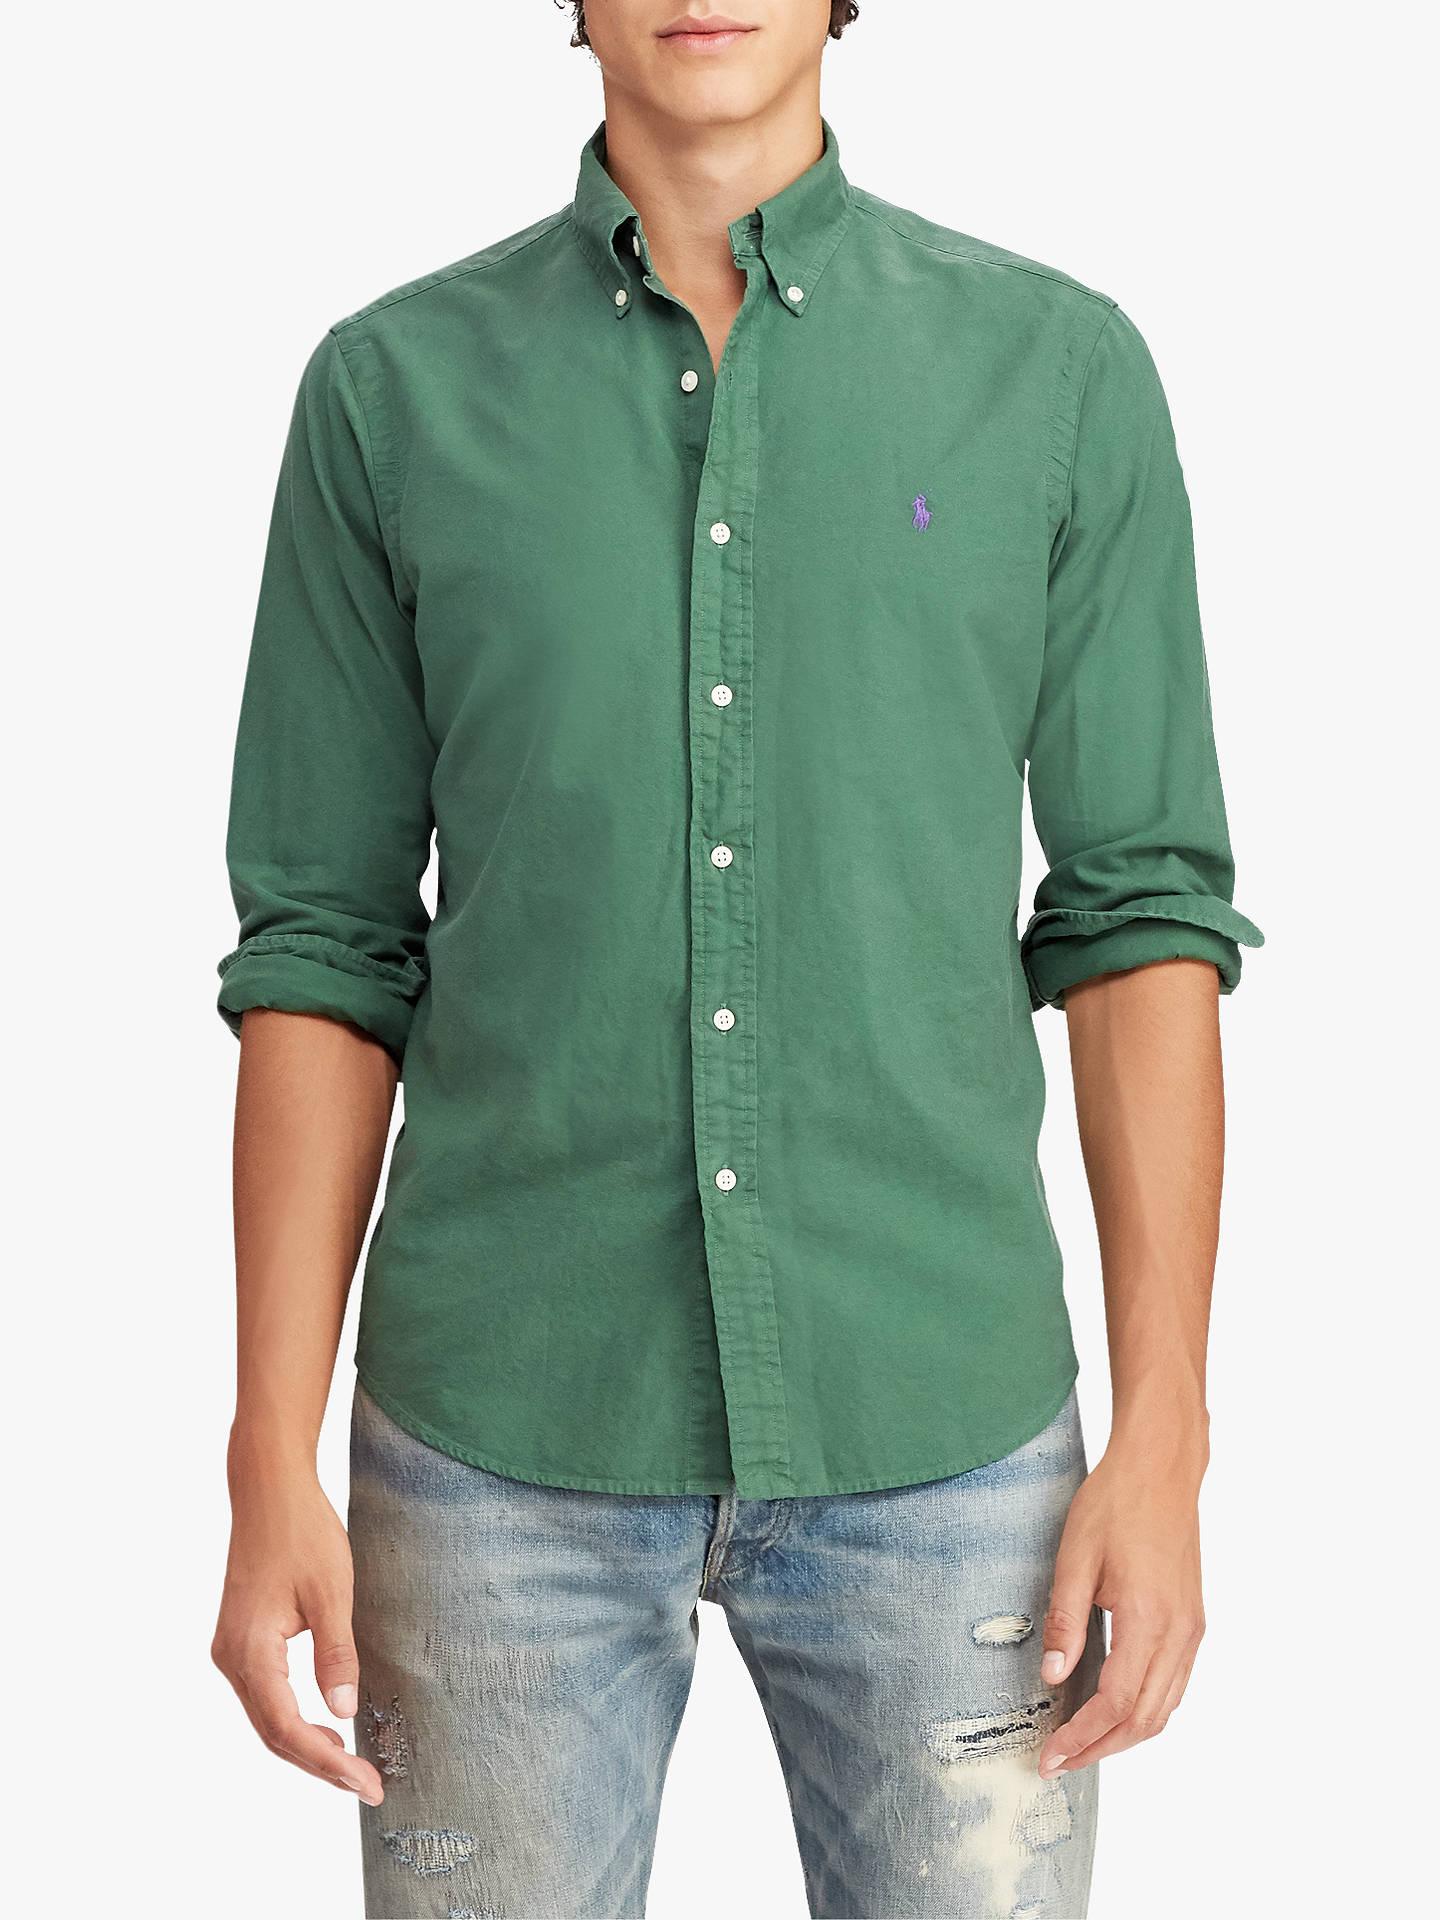 2512a8298183 Polo Ralph Lauren Slim Fit Oxford Shirt at John Lewis   Partners